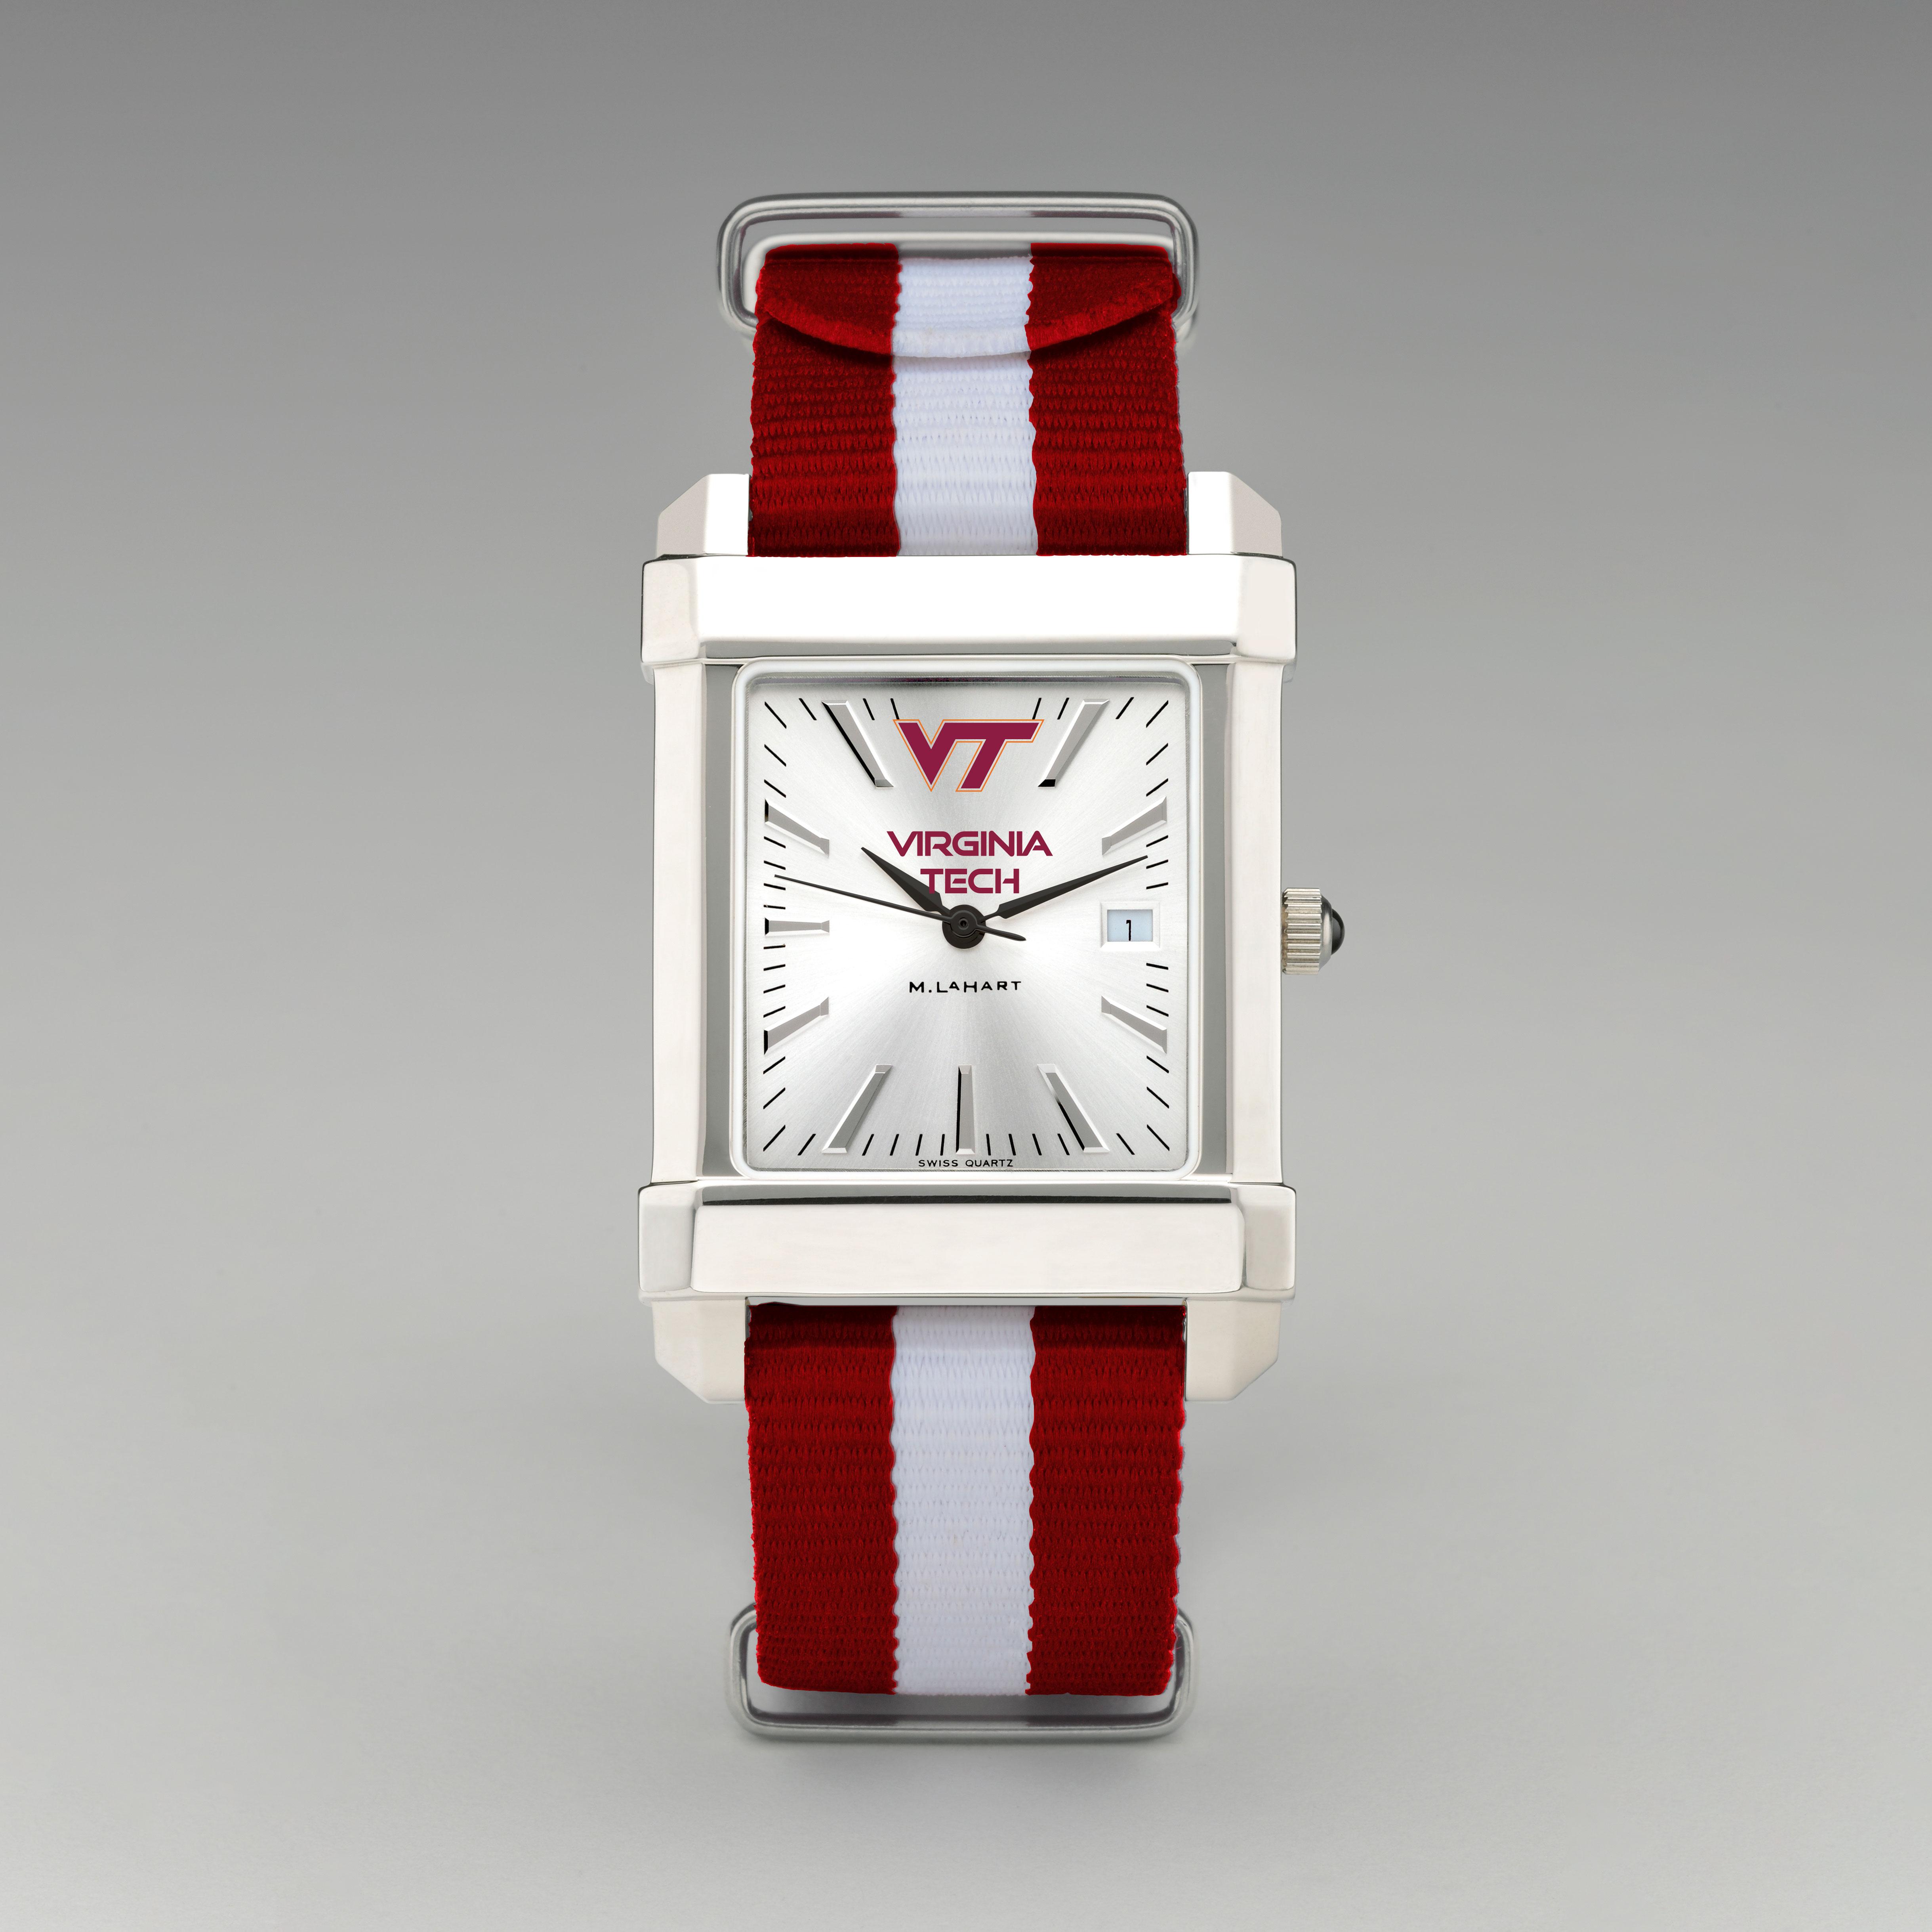 Virginia Tech Collegiate Watch with NATO Strap for Men - Image 2